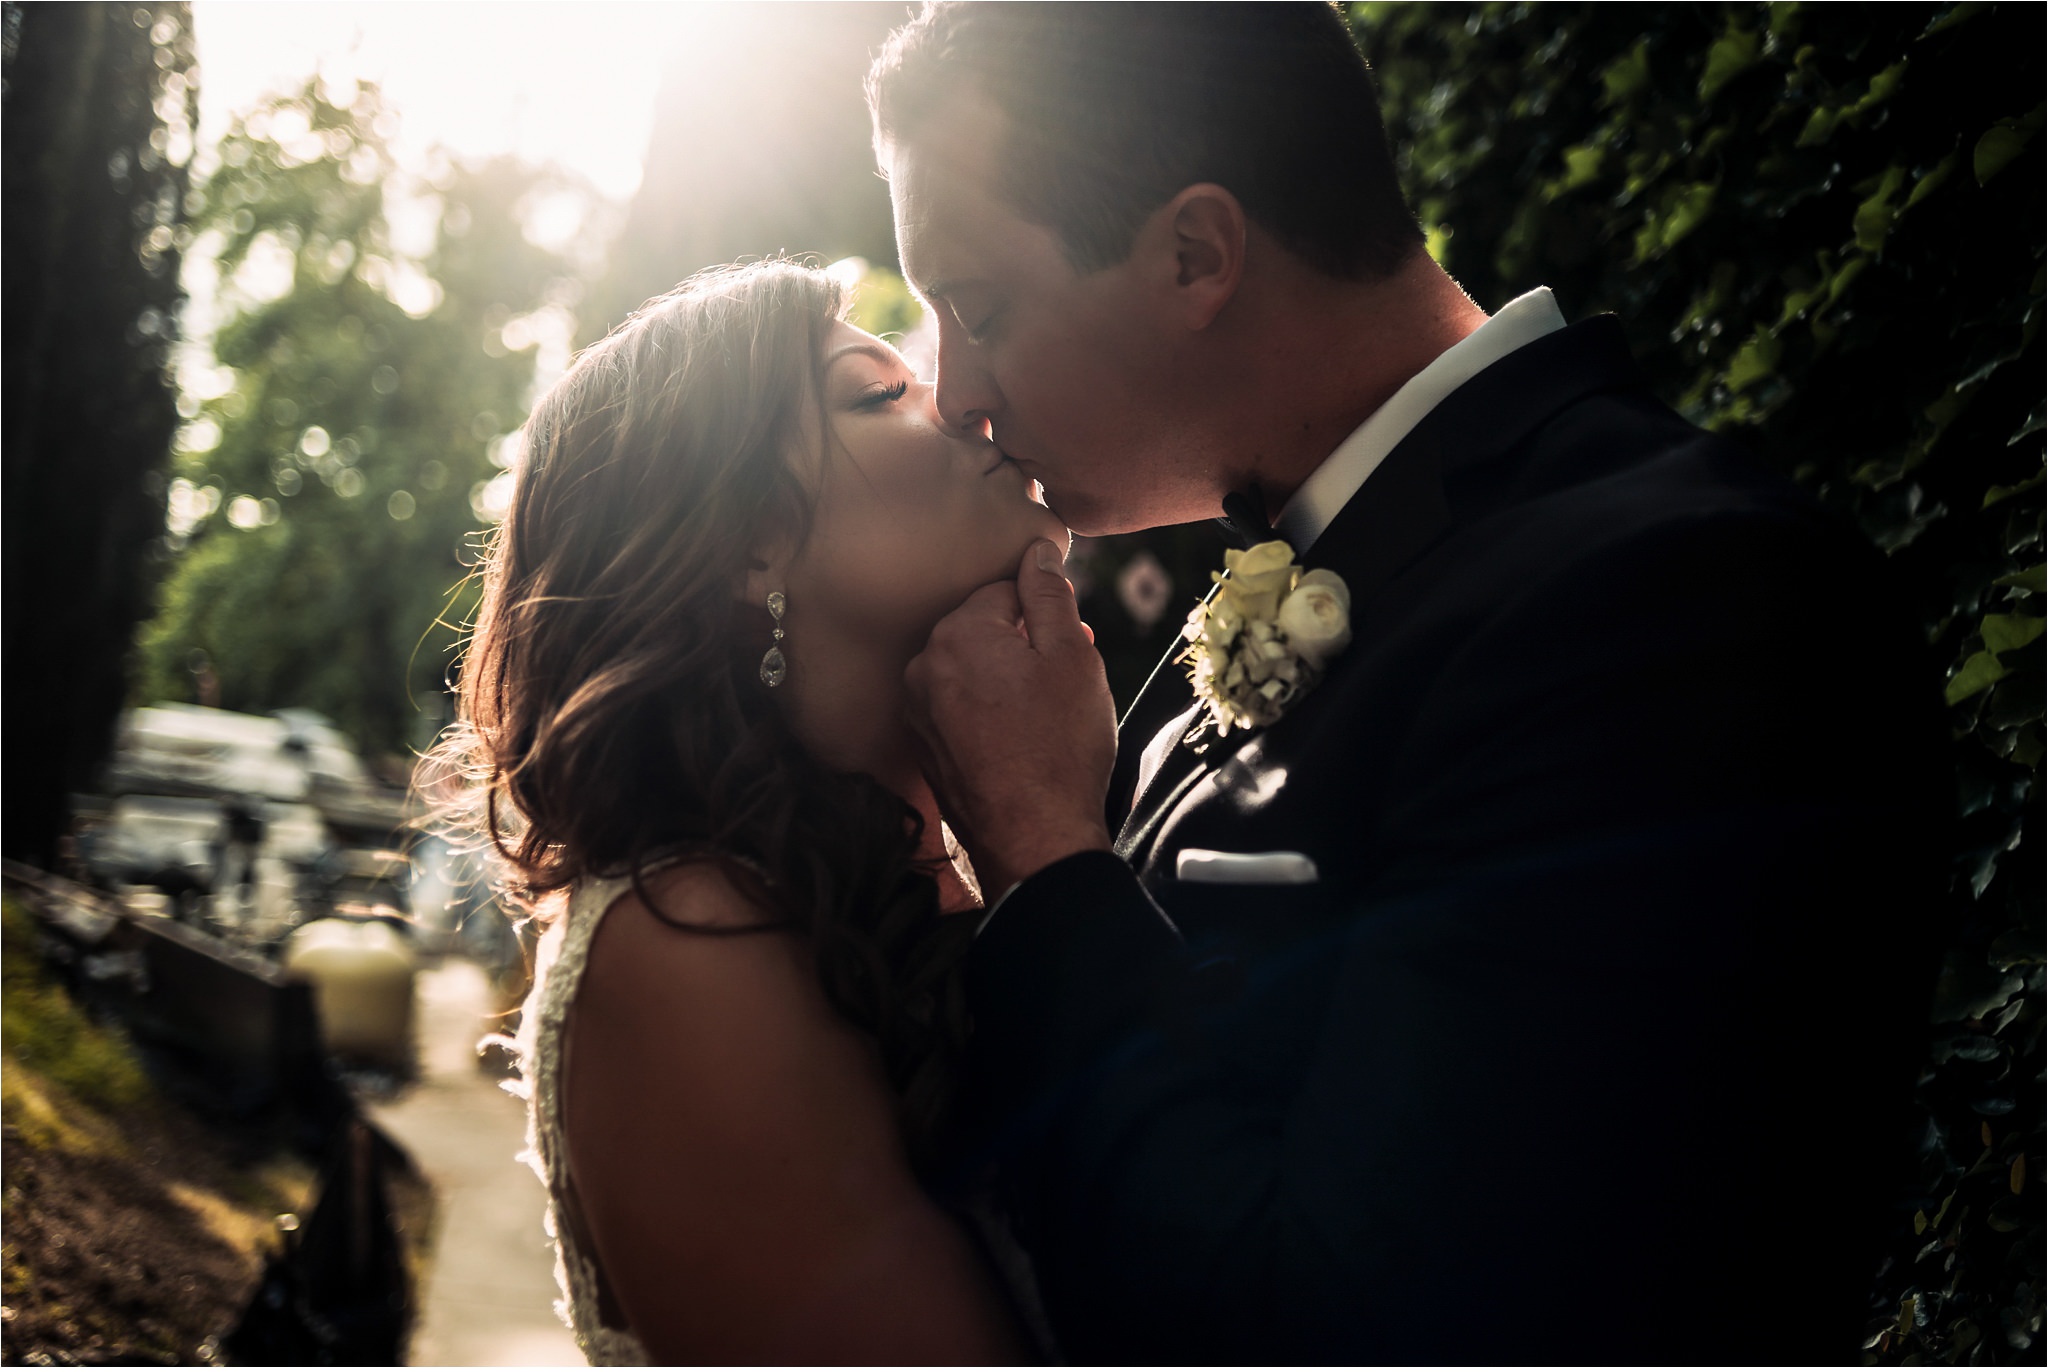 jessica-roman-photography-arden hills wedding photograpger-sacramento-boise-30.jpg